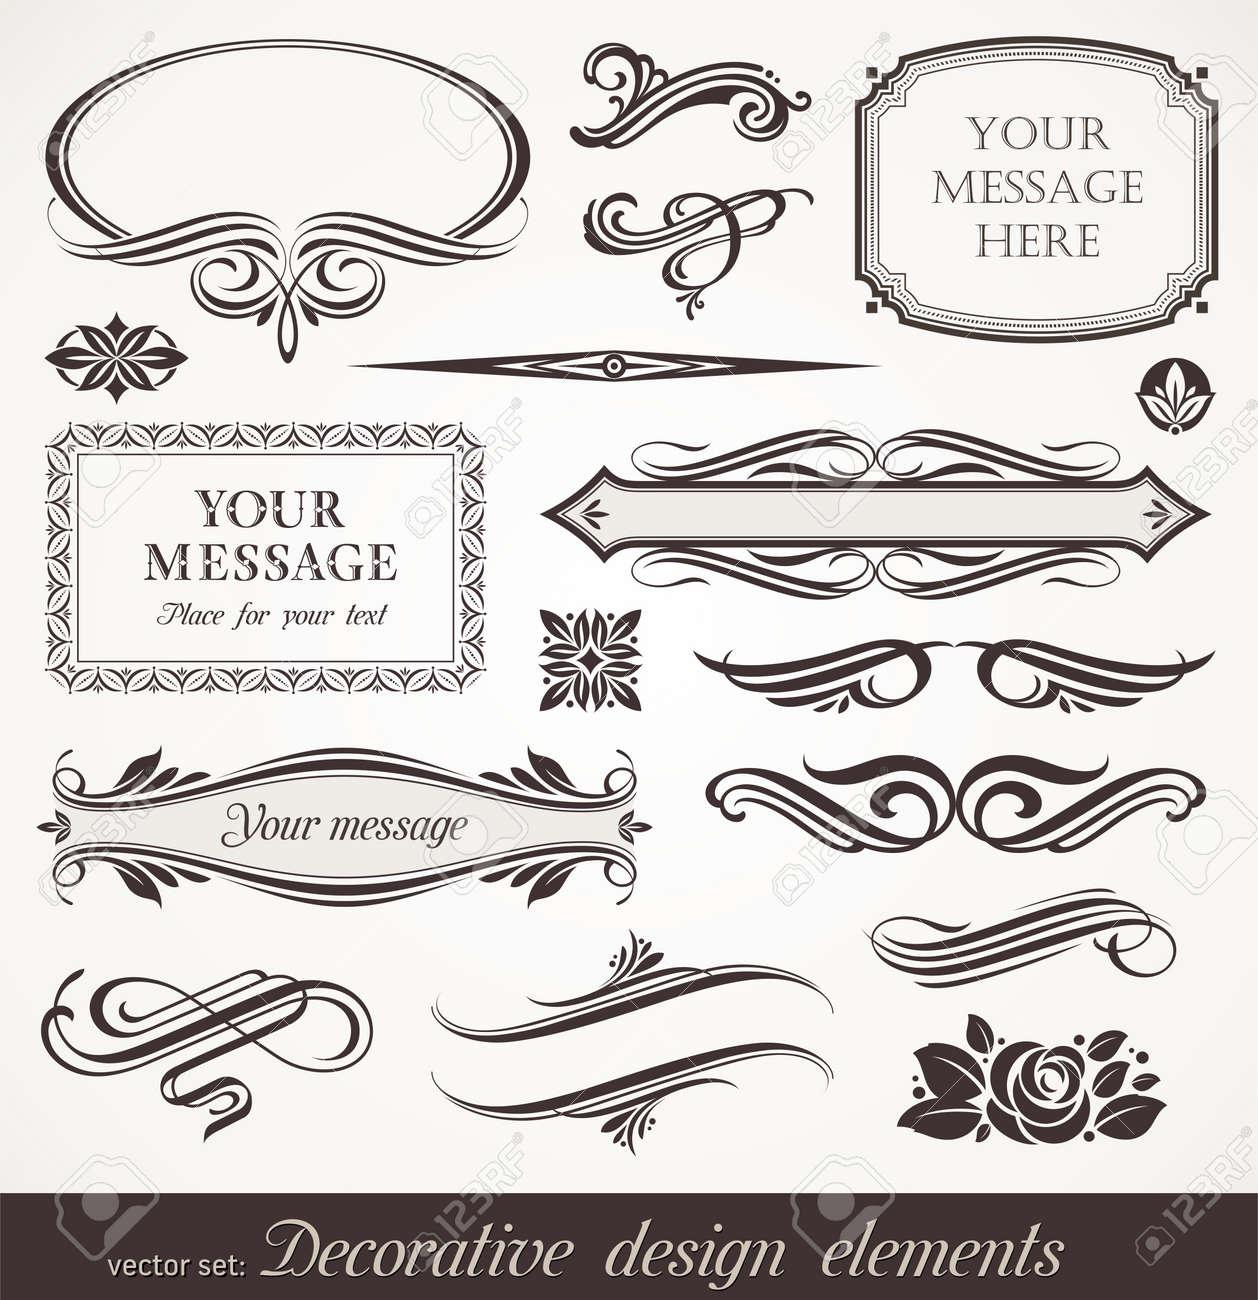 Vector decorative design elements & page decor Stock Vector - 9947817